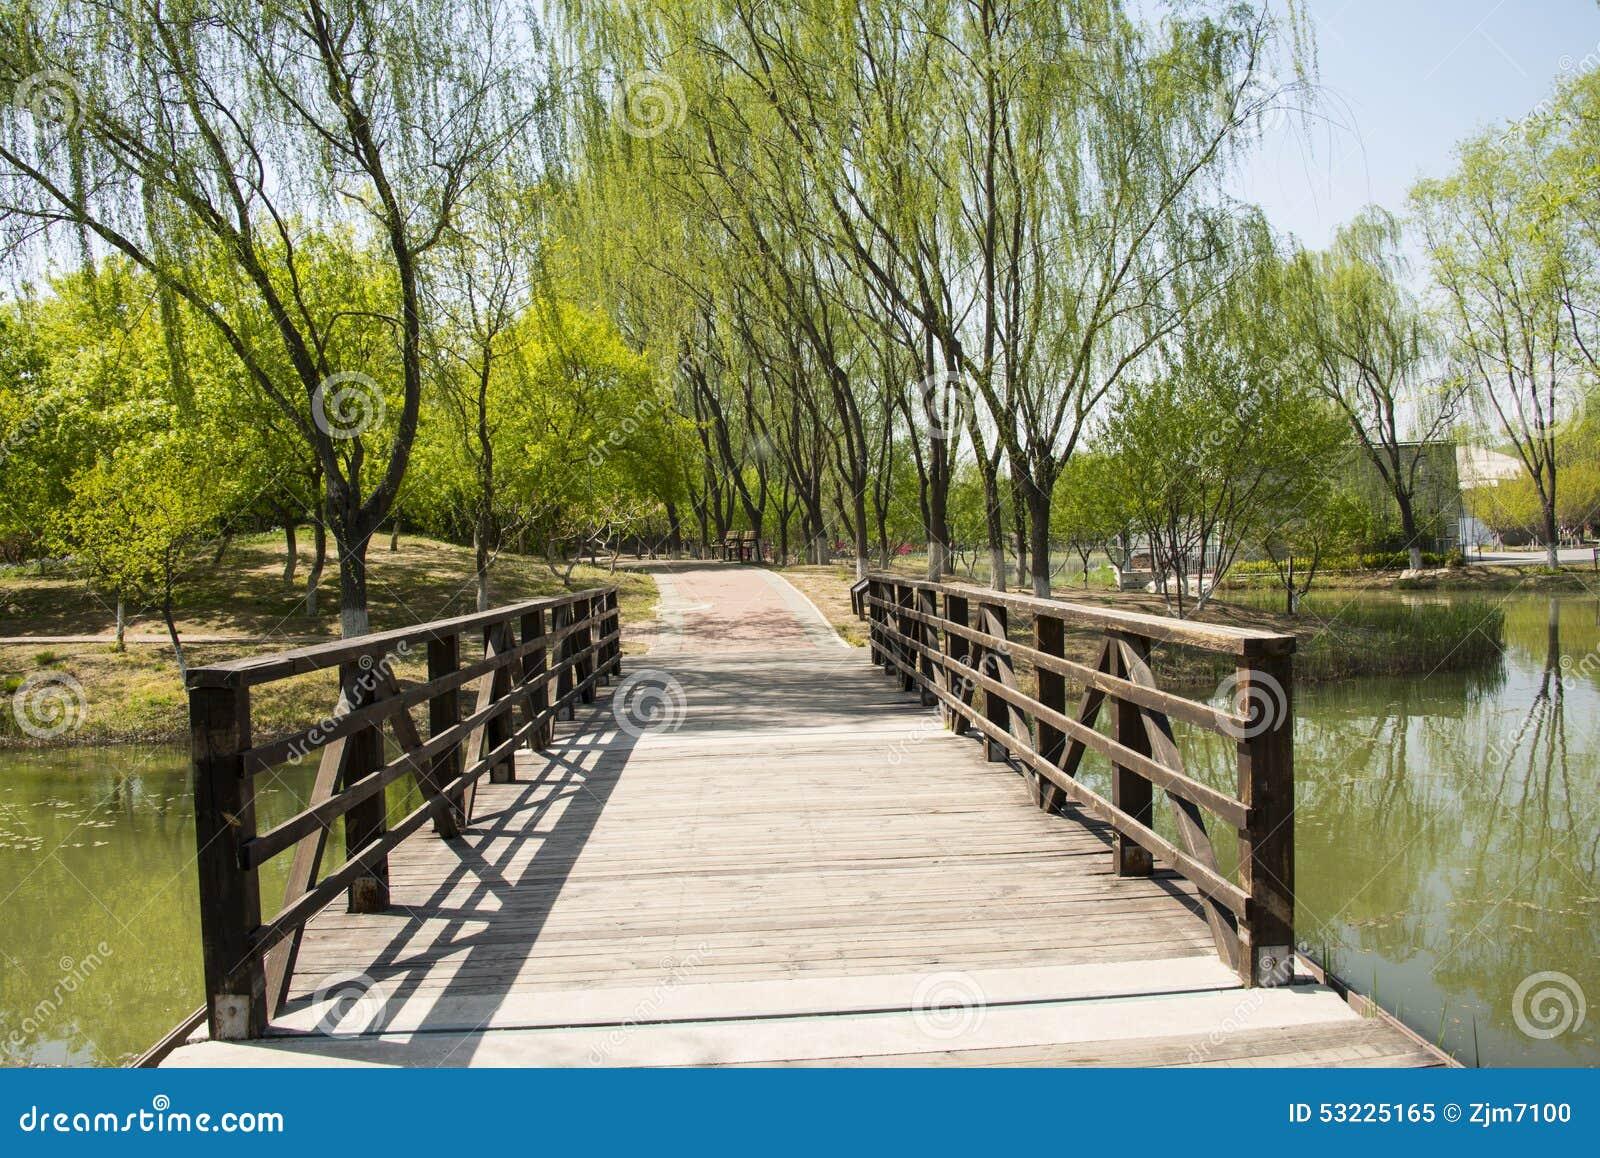 Park Als Tuin : China azië peking olympisch forest park tuin landscapeï houten